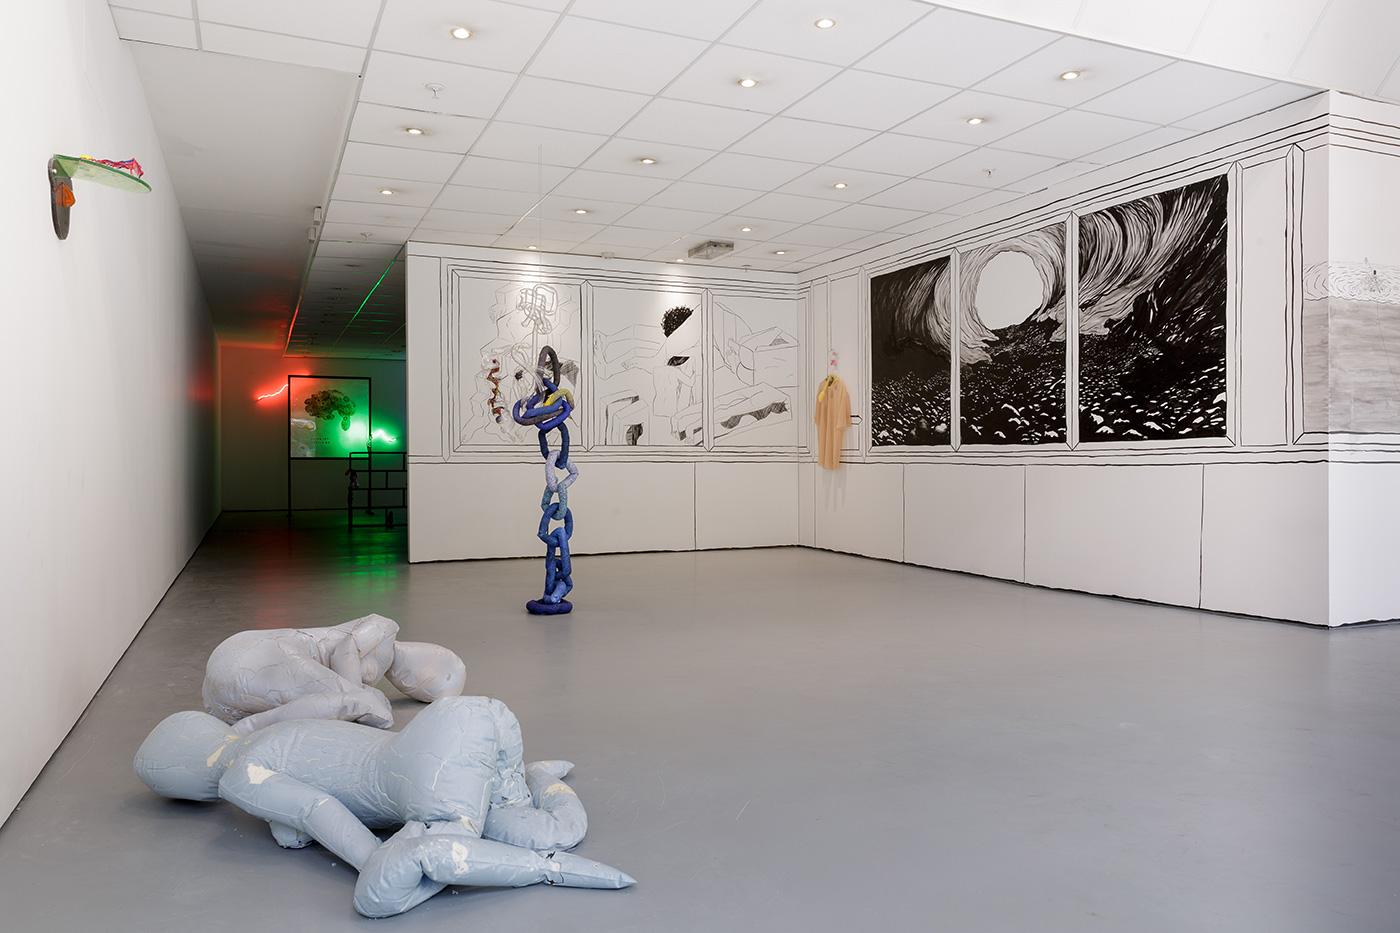 Croydon Arts Store